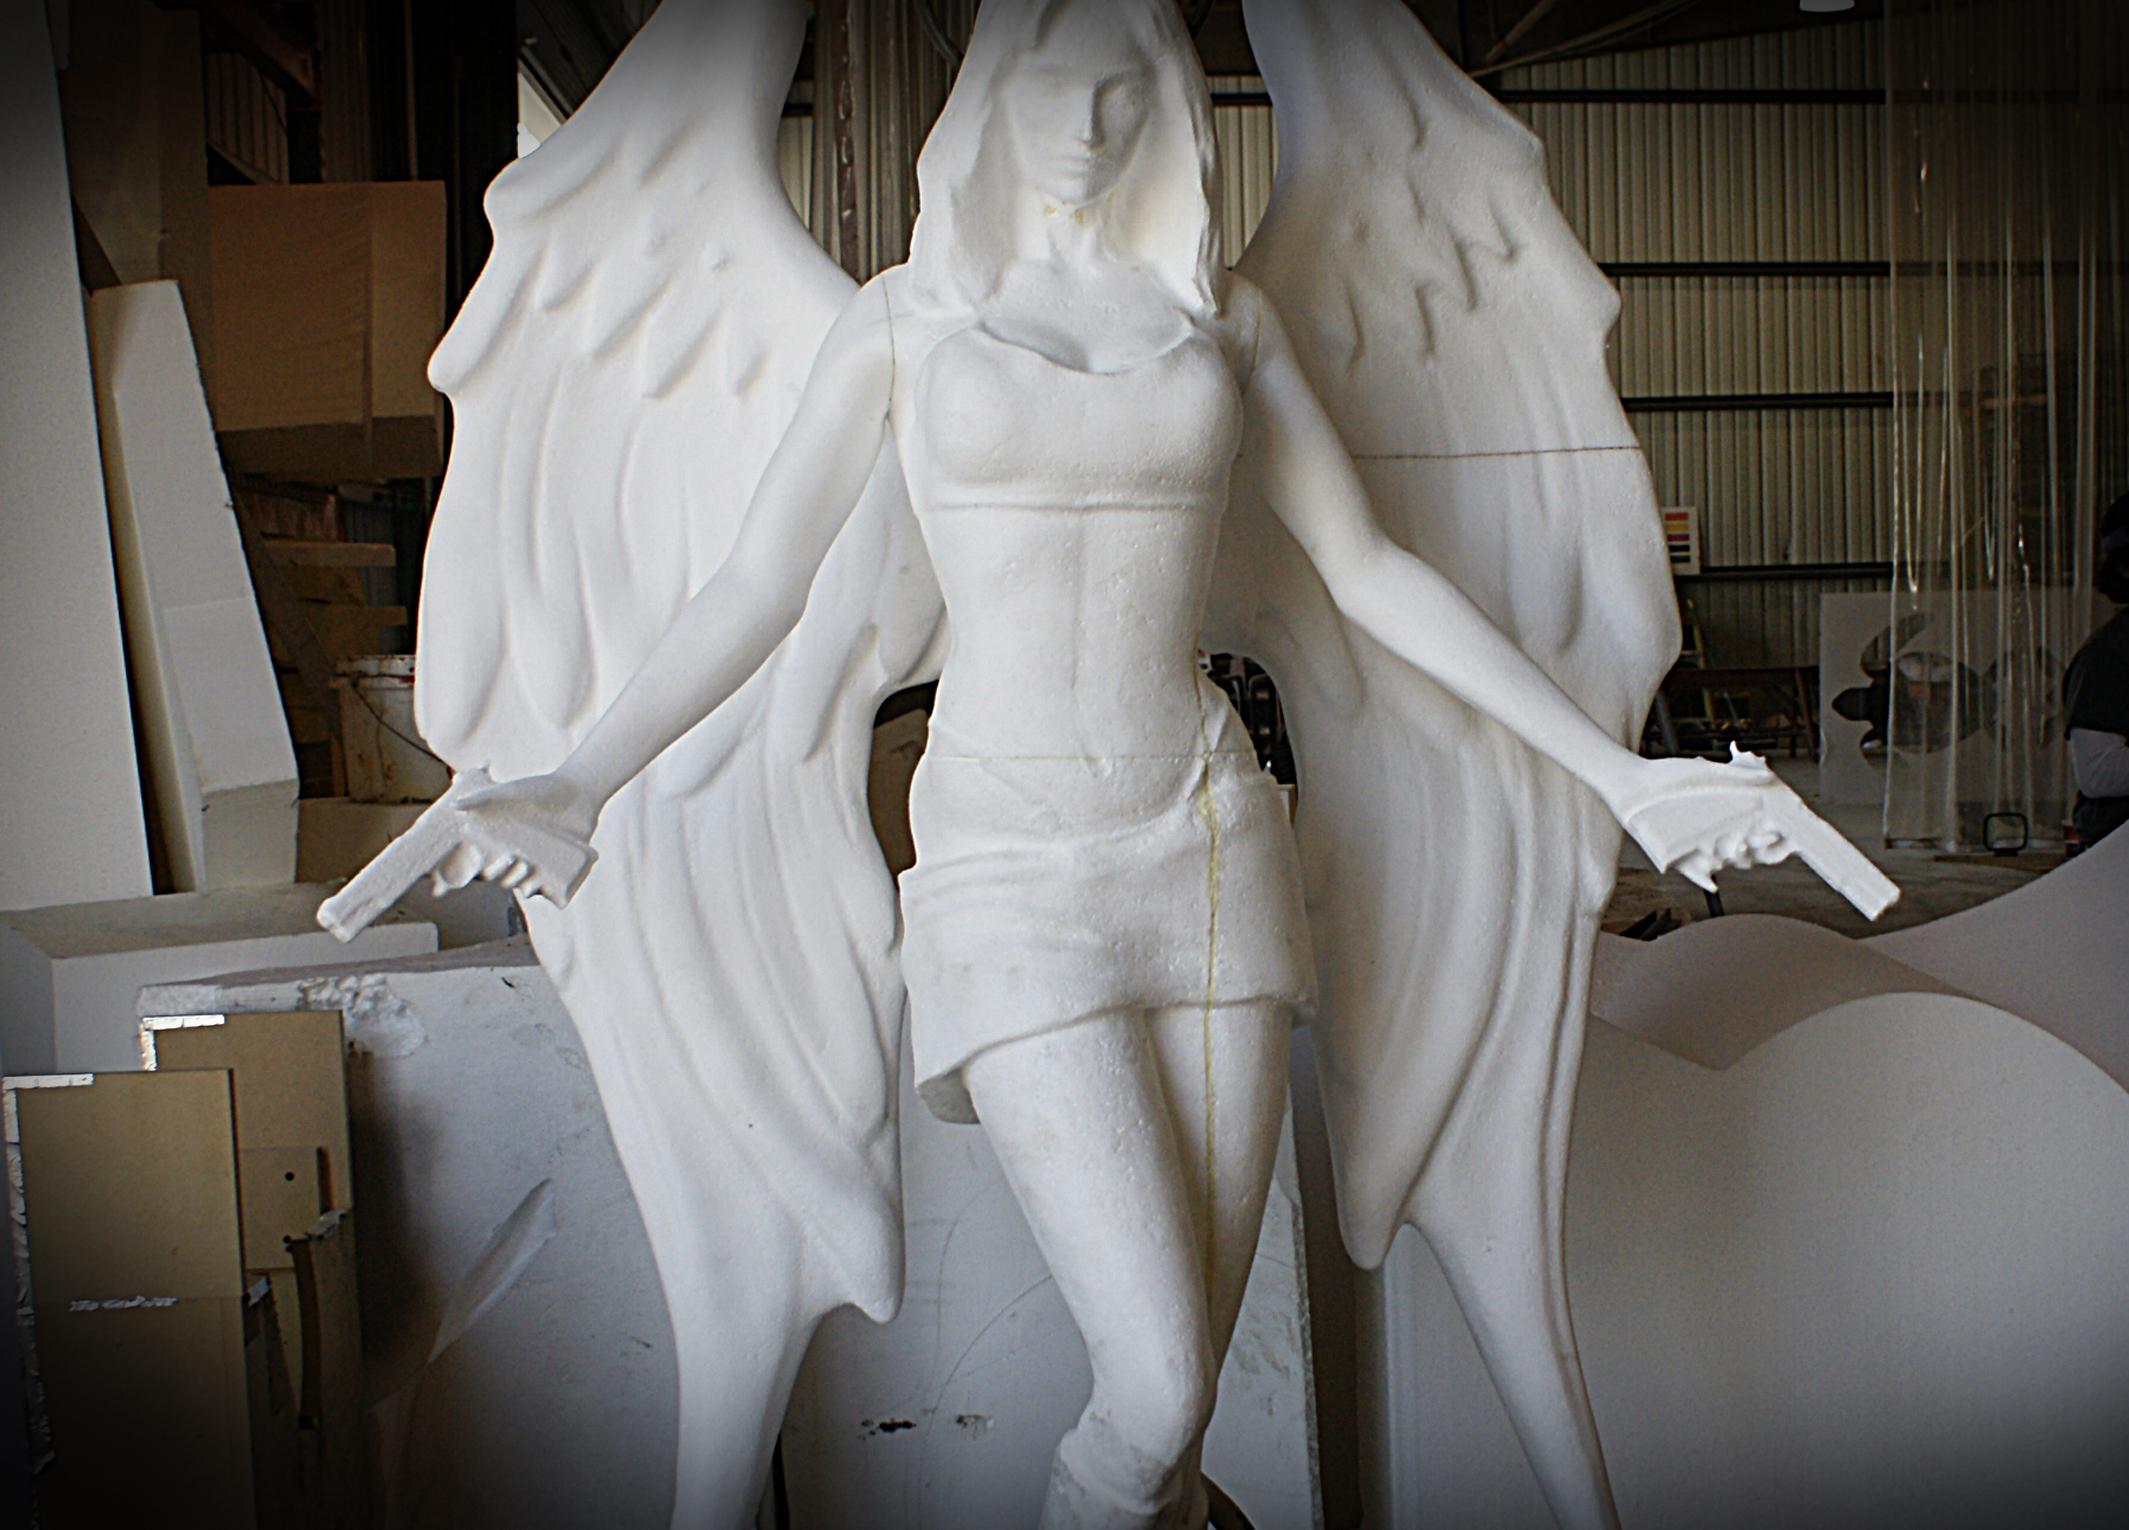 tradeshow-THQ angel assasin 4.jpg